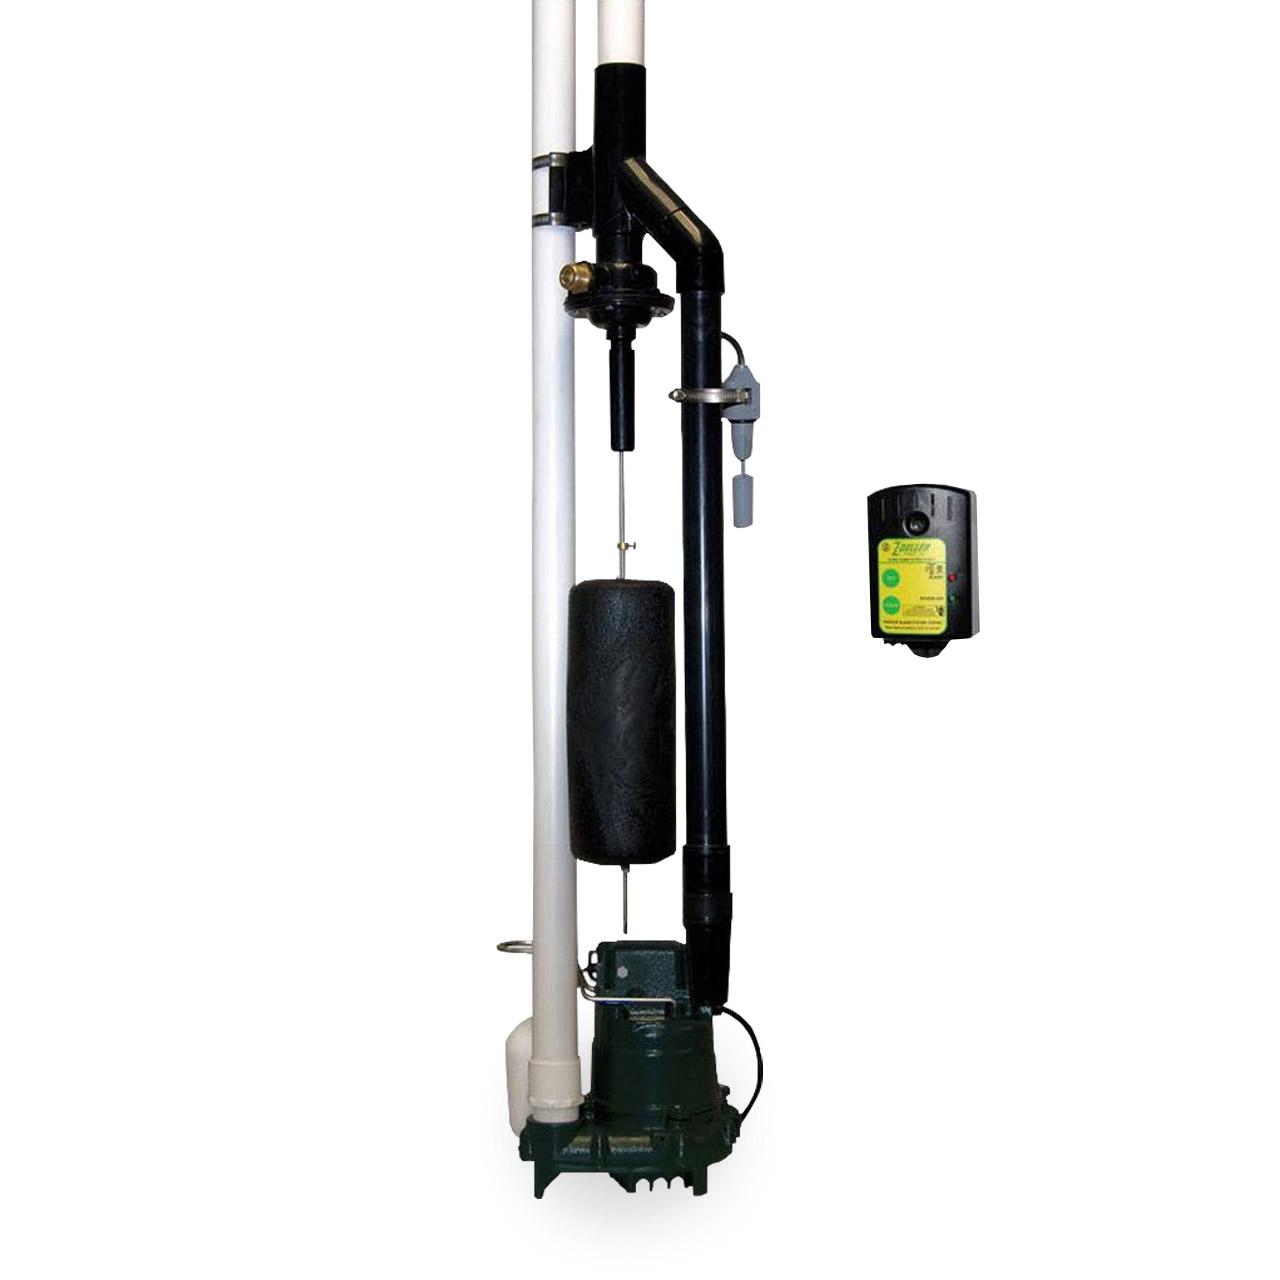 Sump Pump Systems : Sump pump backup system zoeller